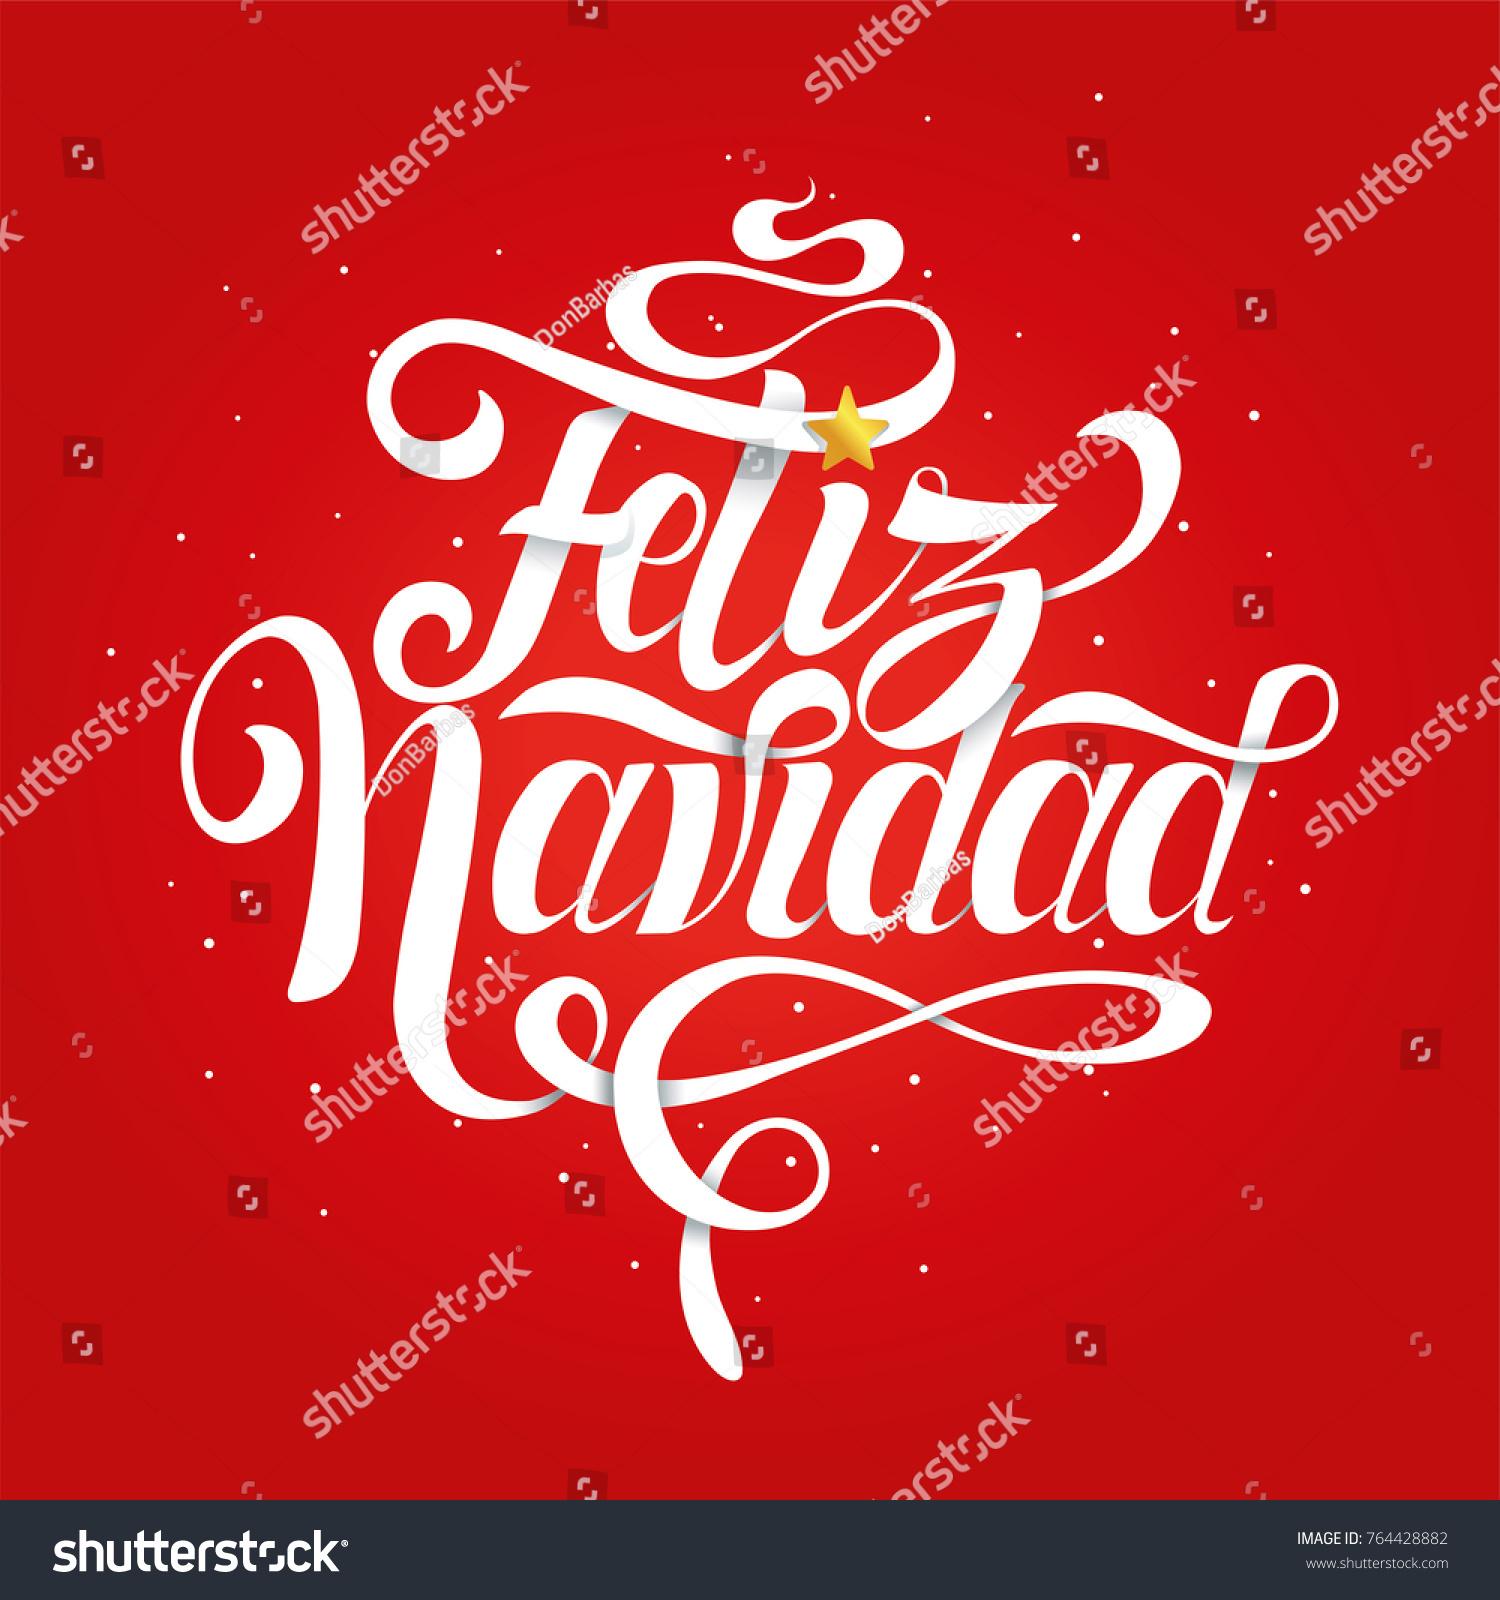 Feliz Navidad Merry Christmas Spanish Vector Stock Vector Royalty